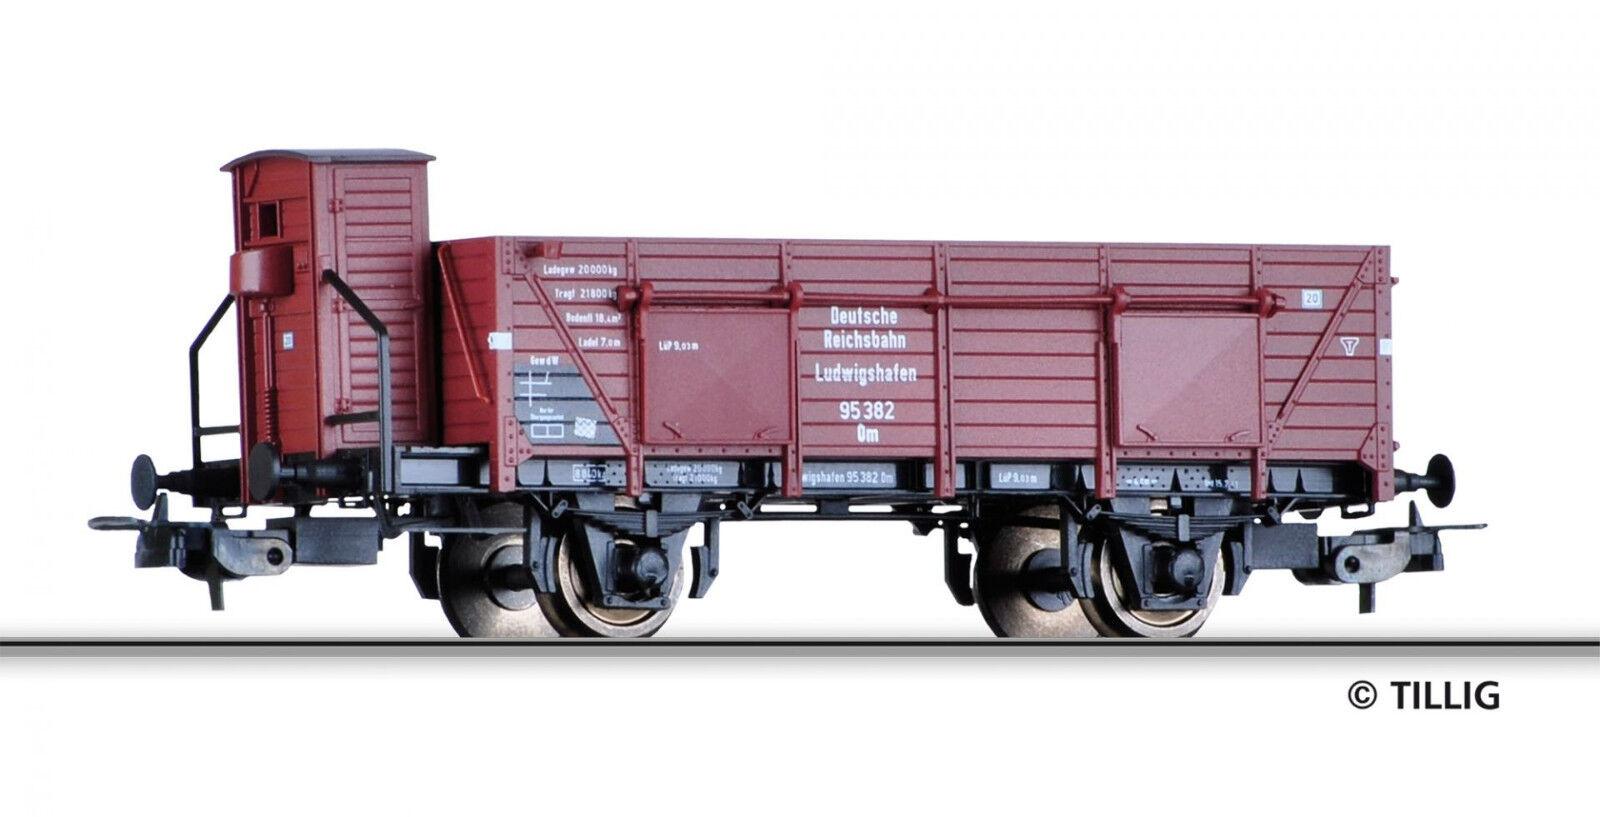 Tillig 76693 H0 Offener Güterwagen DRG EP II NEU OVP, OVP, OVP, 662704